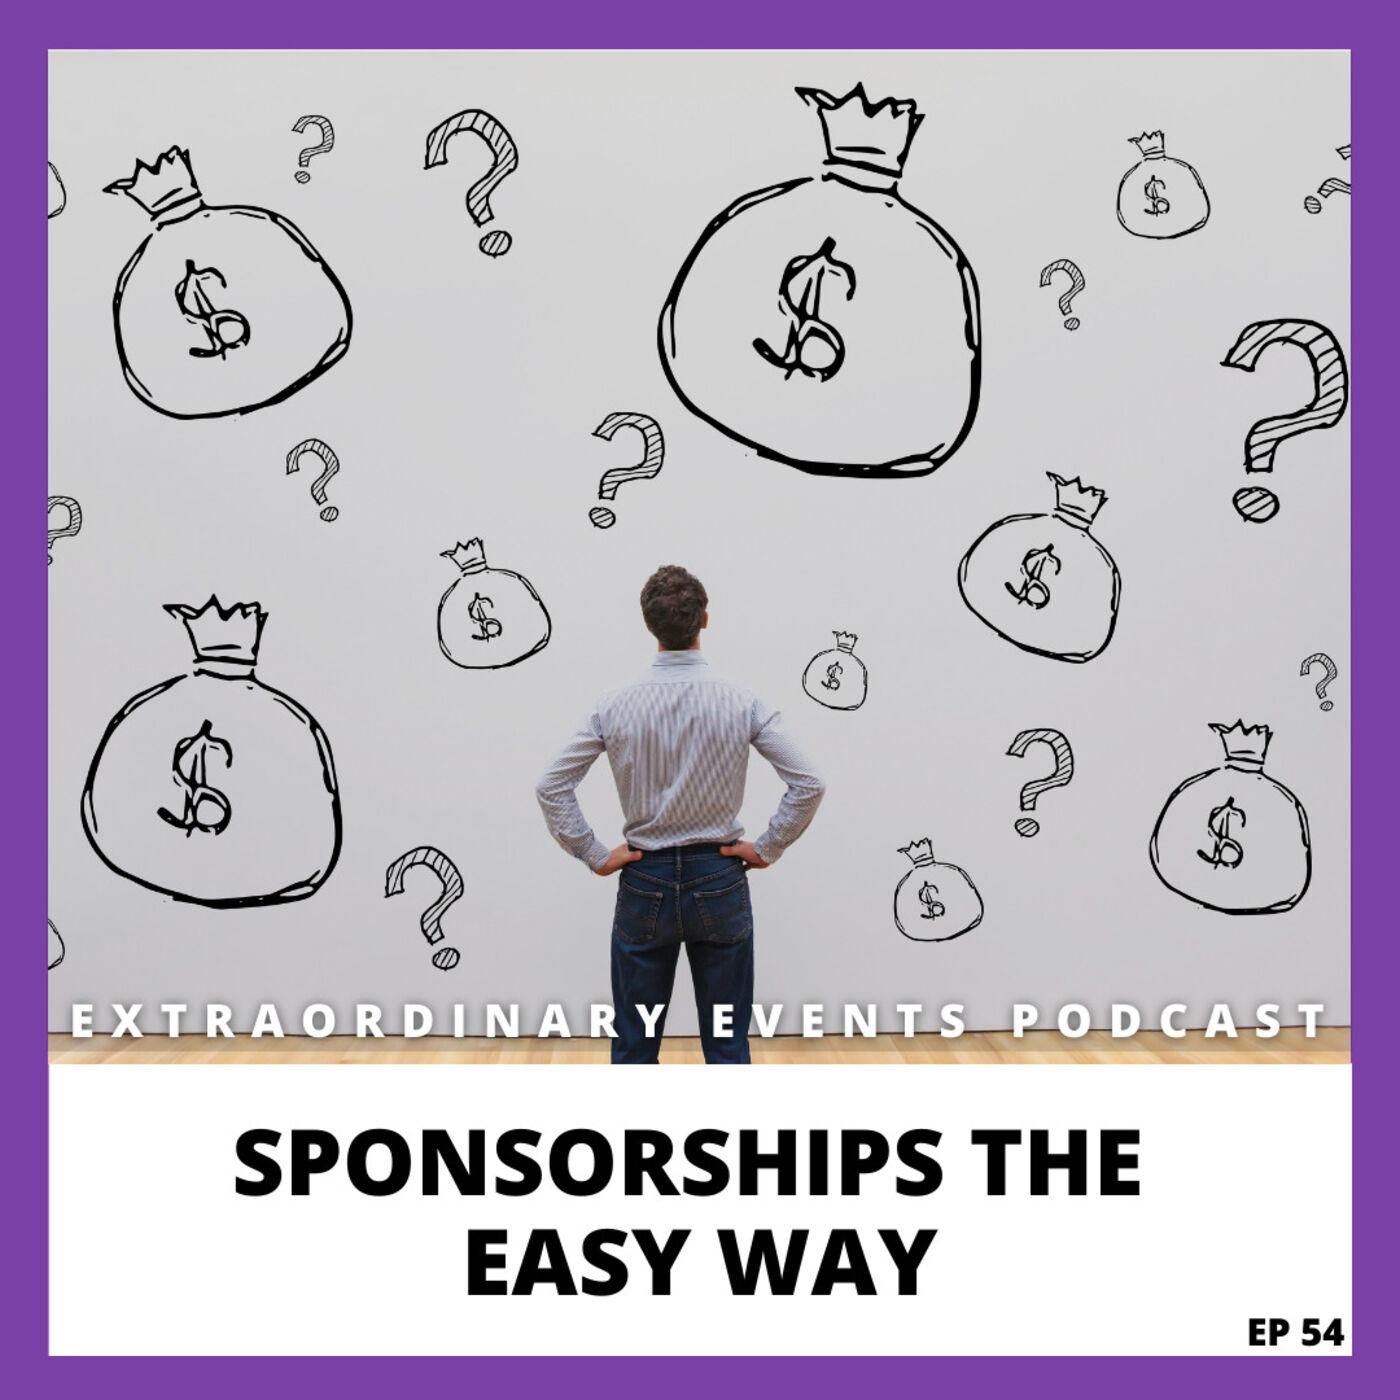 Ep 54: Sponsorship the Easy Way